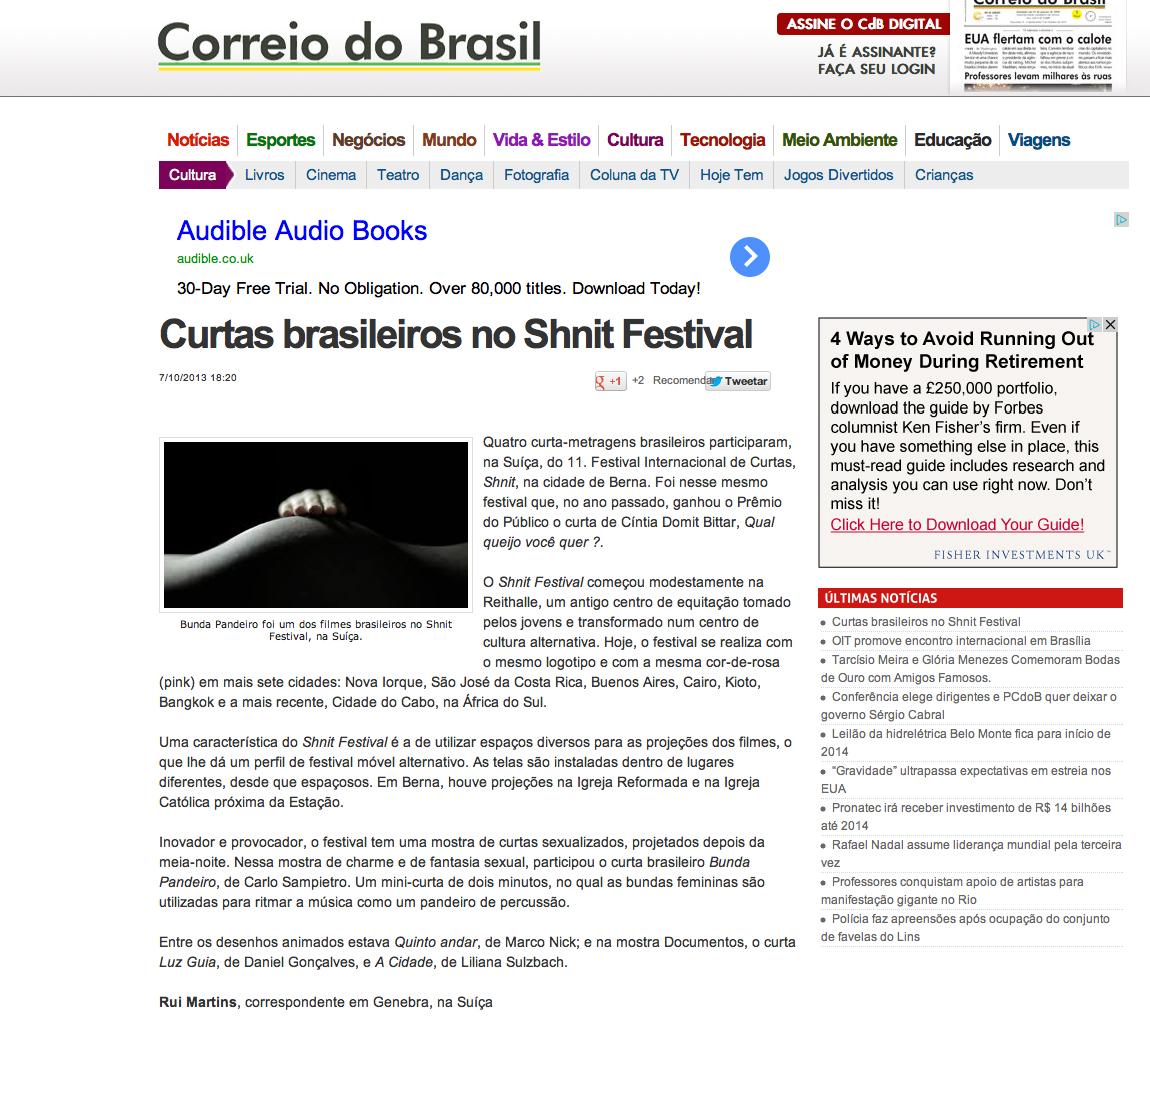 correio.do.brasil